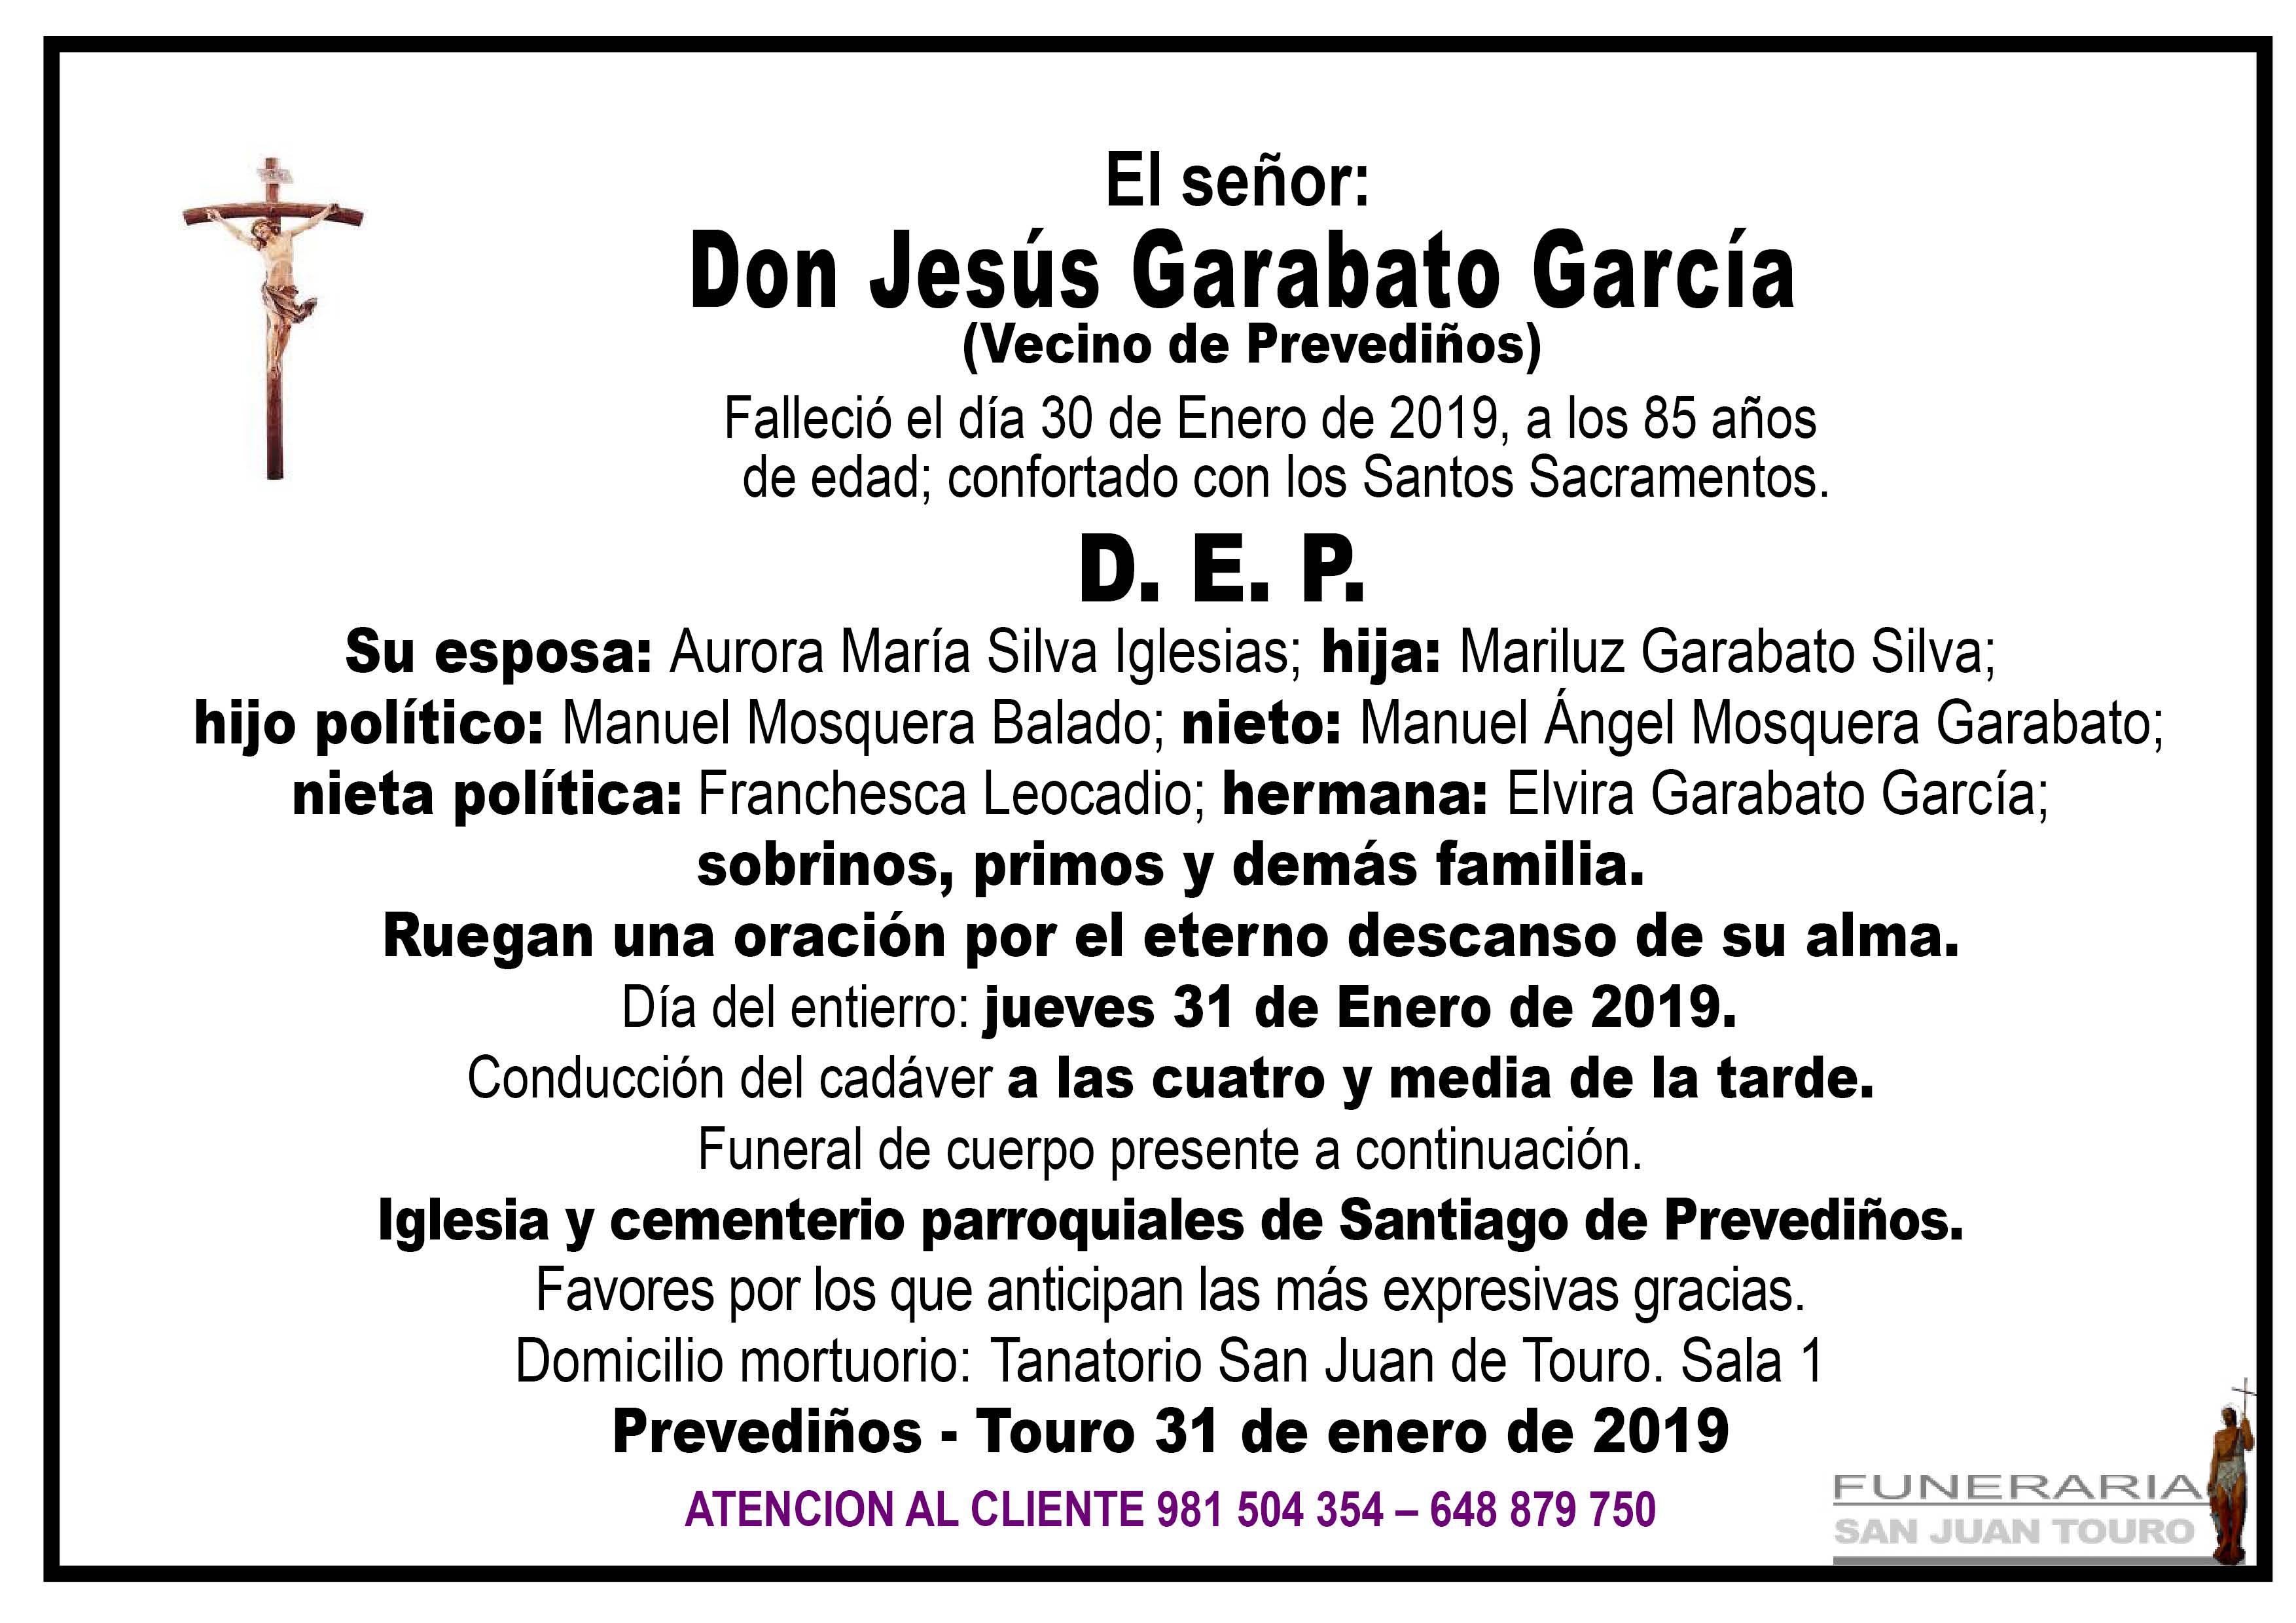 Esquela de SEPELIO DE DON JESÚS GARABATO GARCÍA